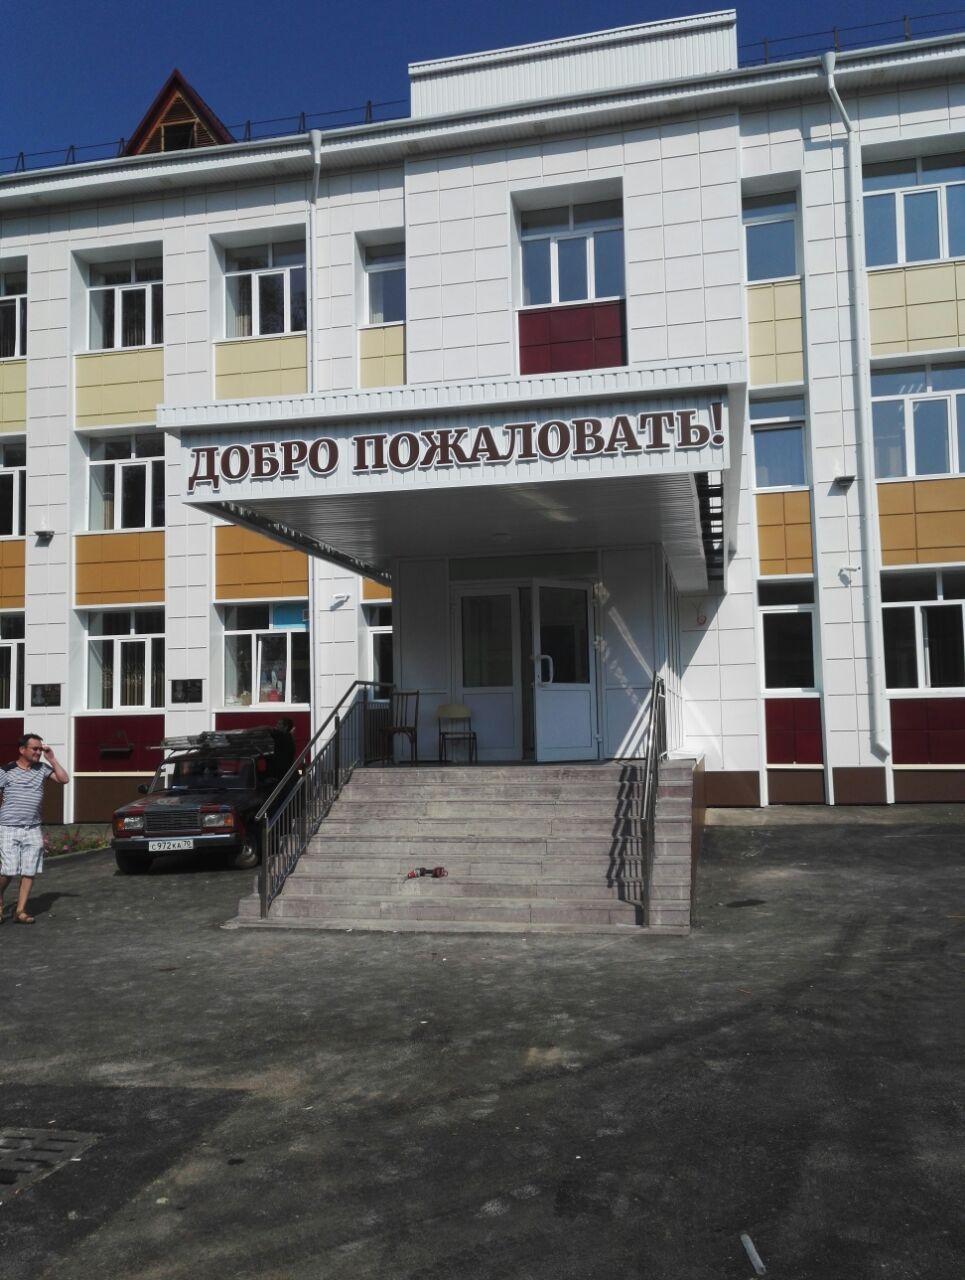 Школа 32, Томск, объемные буквы